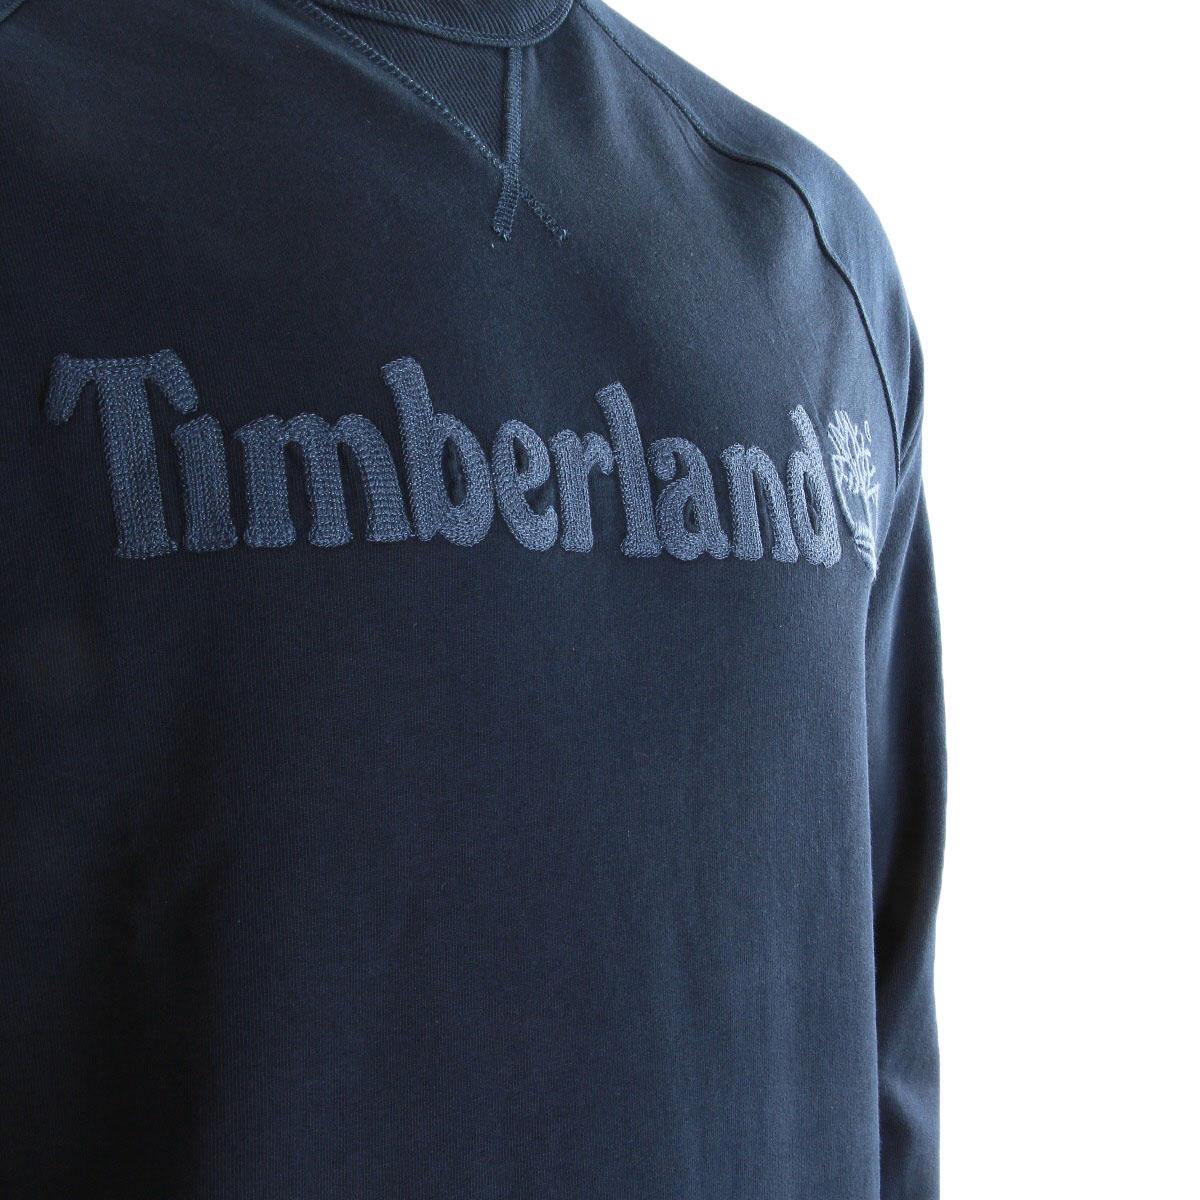 timberland pull bleu marine a151o433 pulls homme. Black Bedroom Furniture Sets. Home Design Ideas